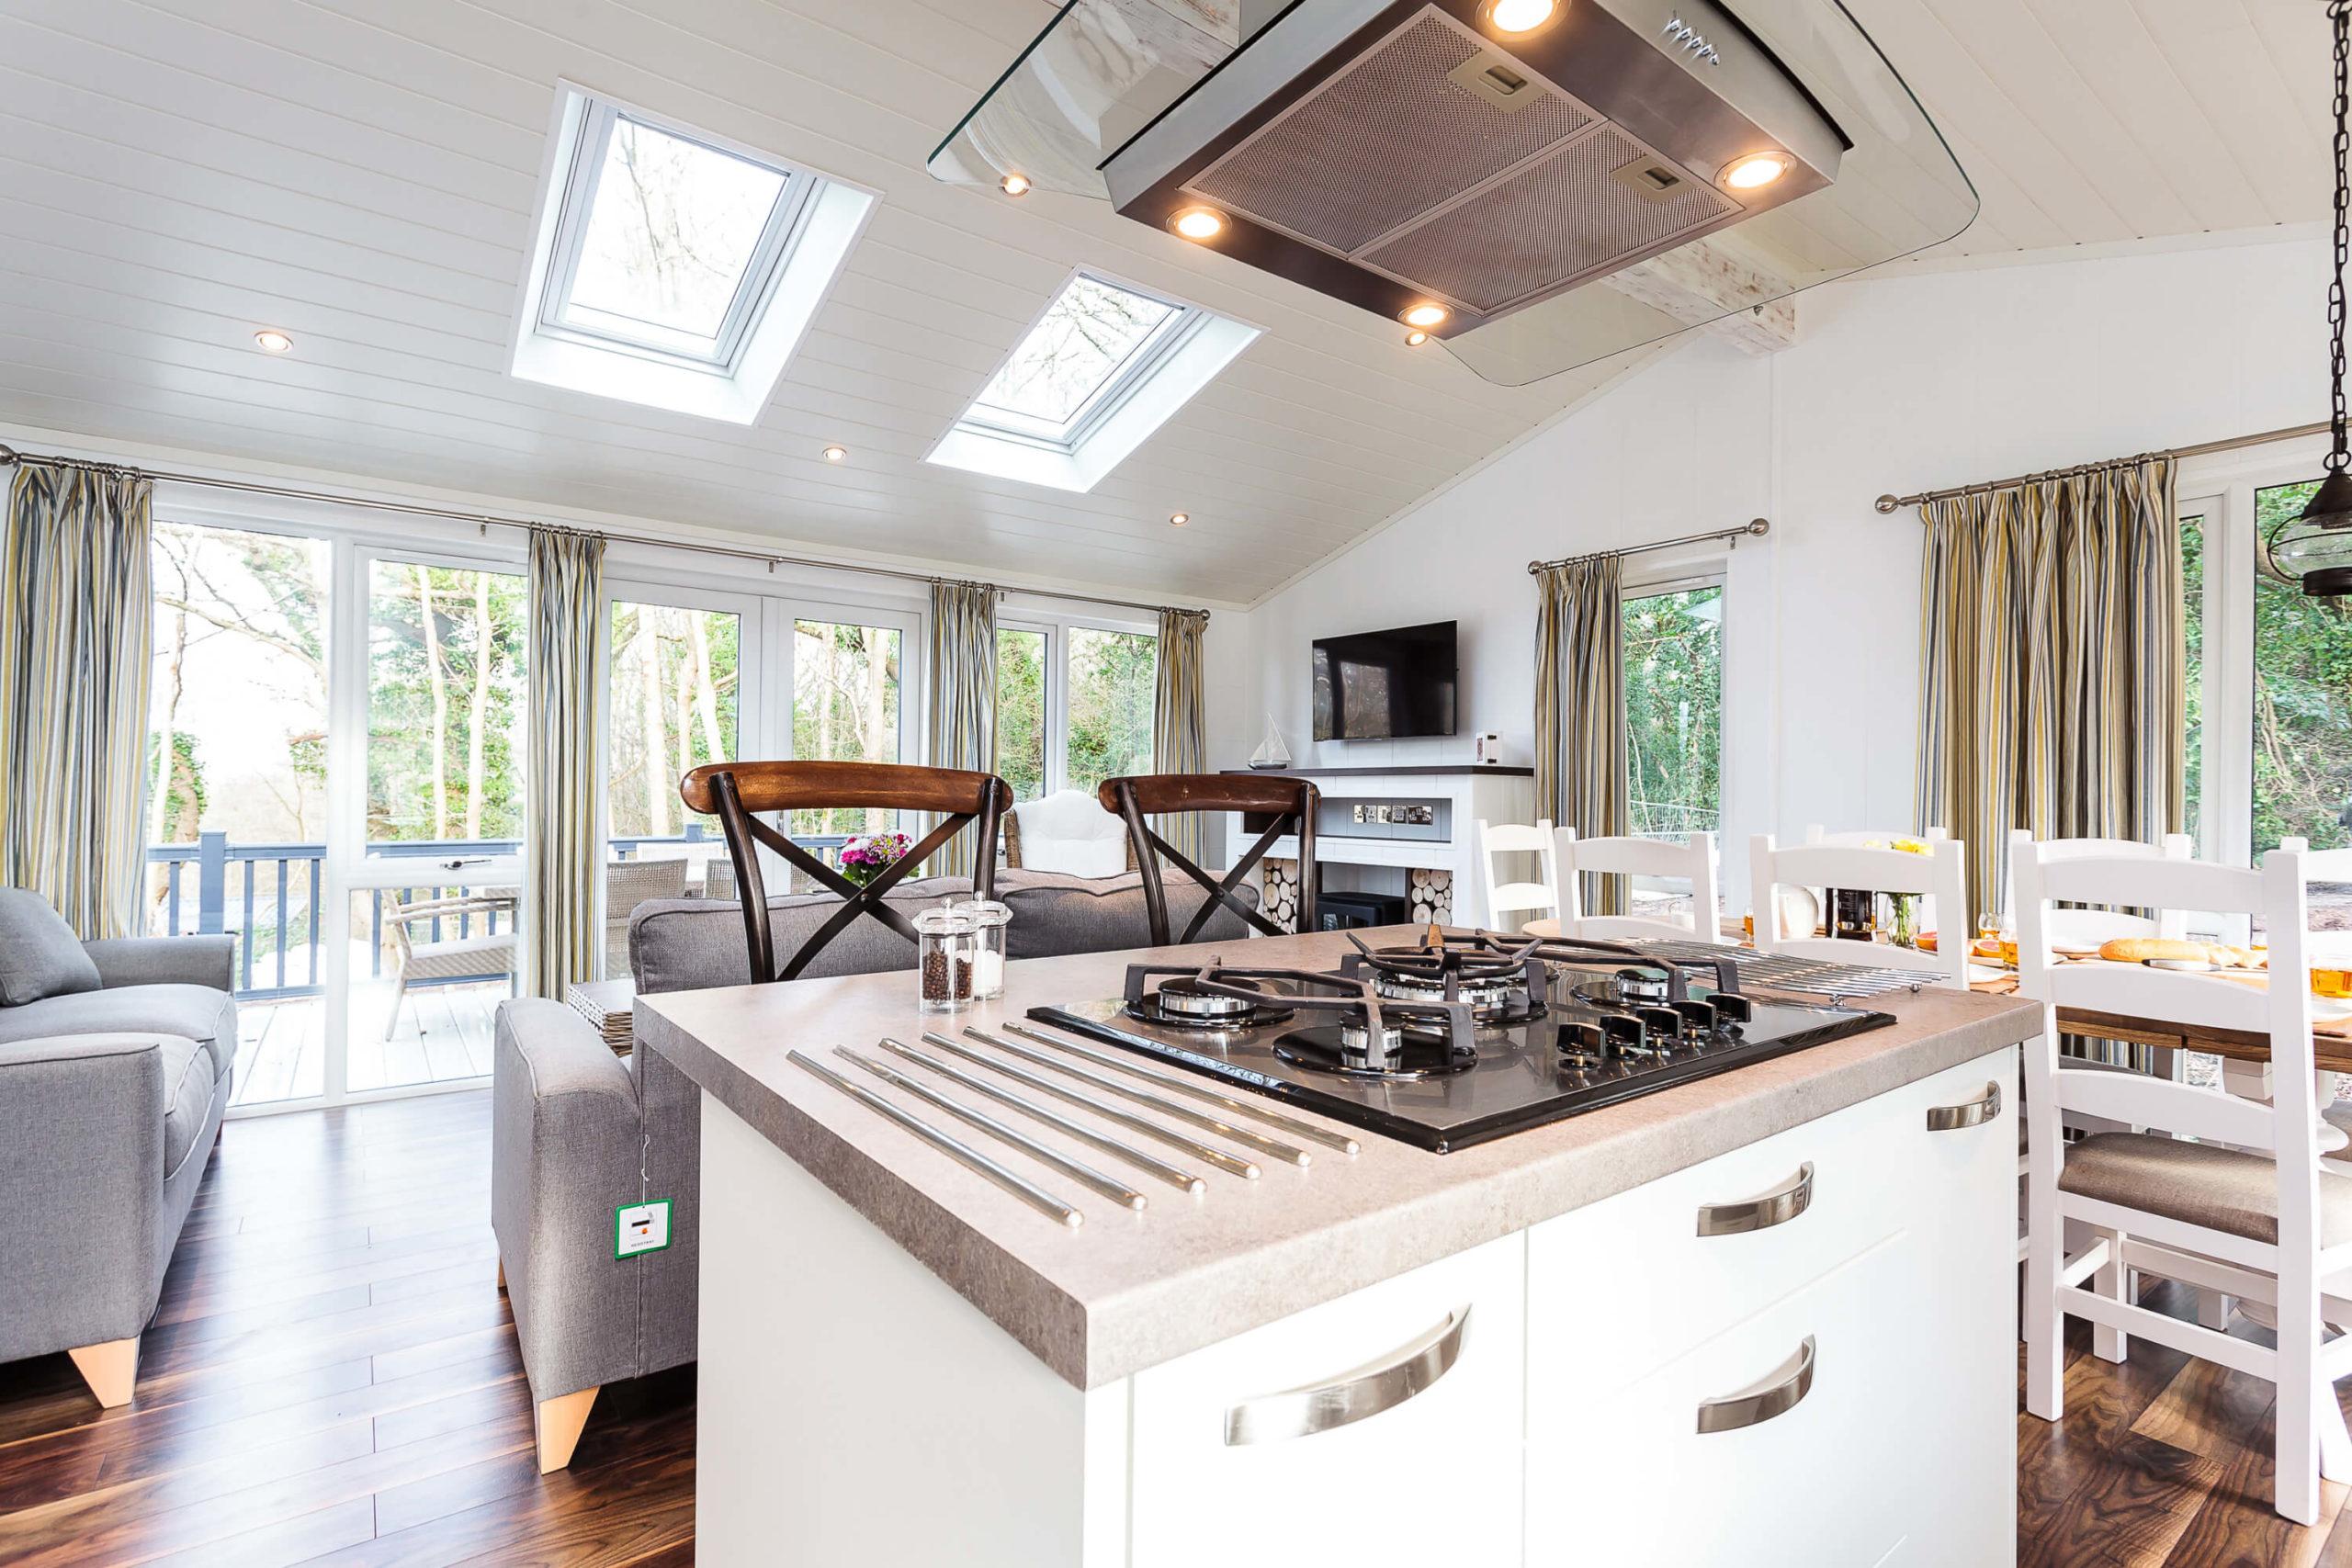 Interior shot of a Woodside Bay lodge kitchen island